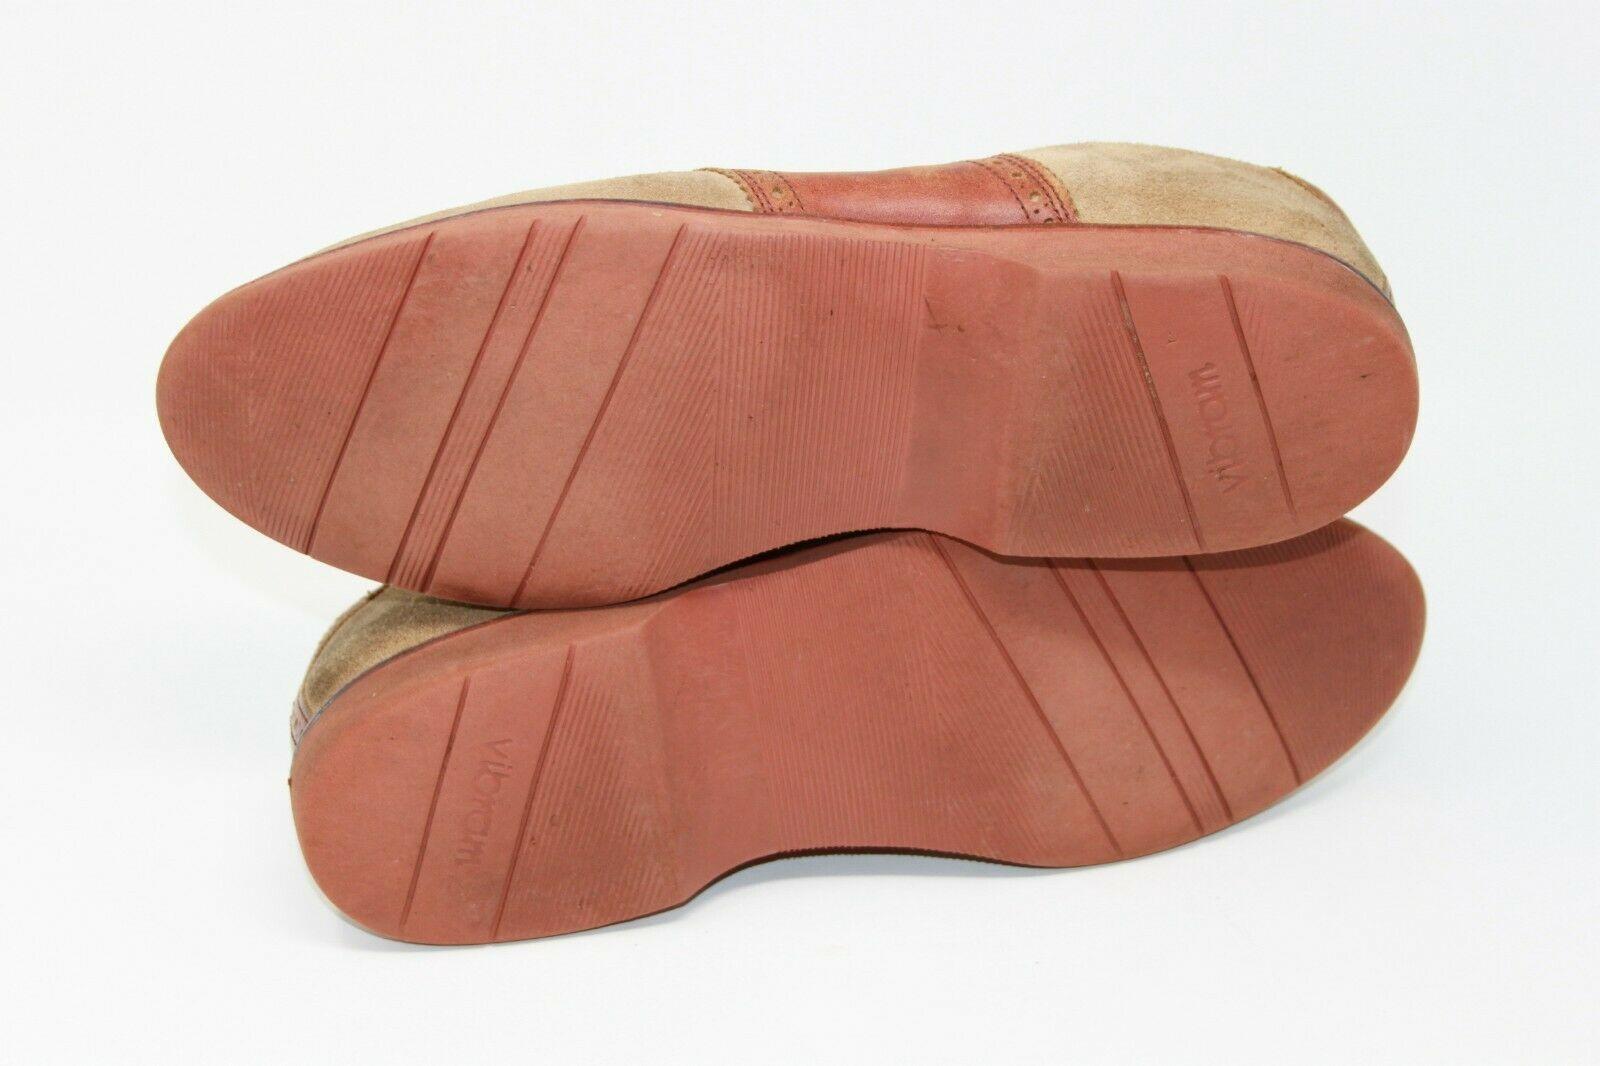 Footjoy Size 11.5 FJ Golf Shoes Spikeless Classics Dress Casual Walkers USA Made